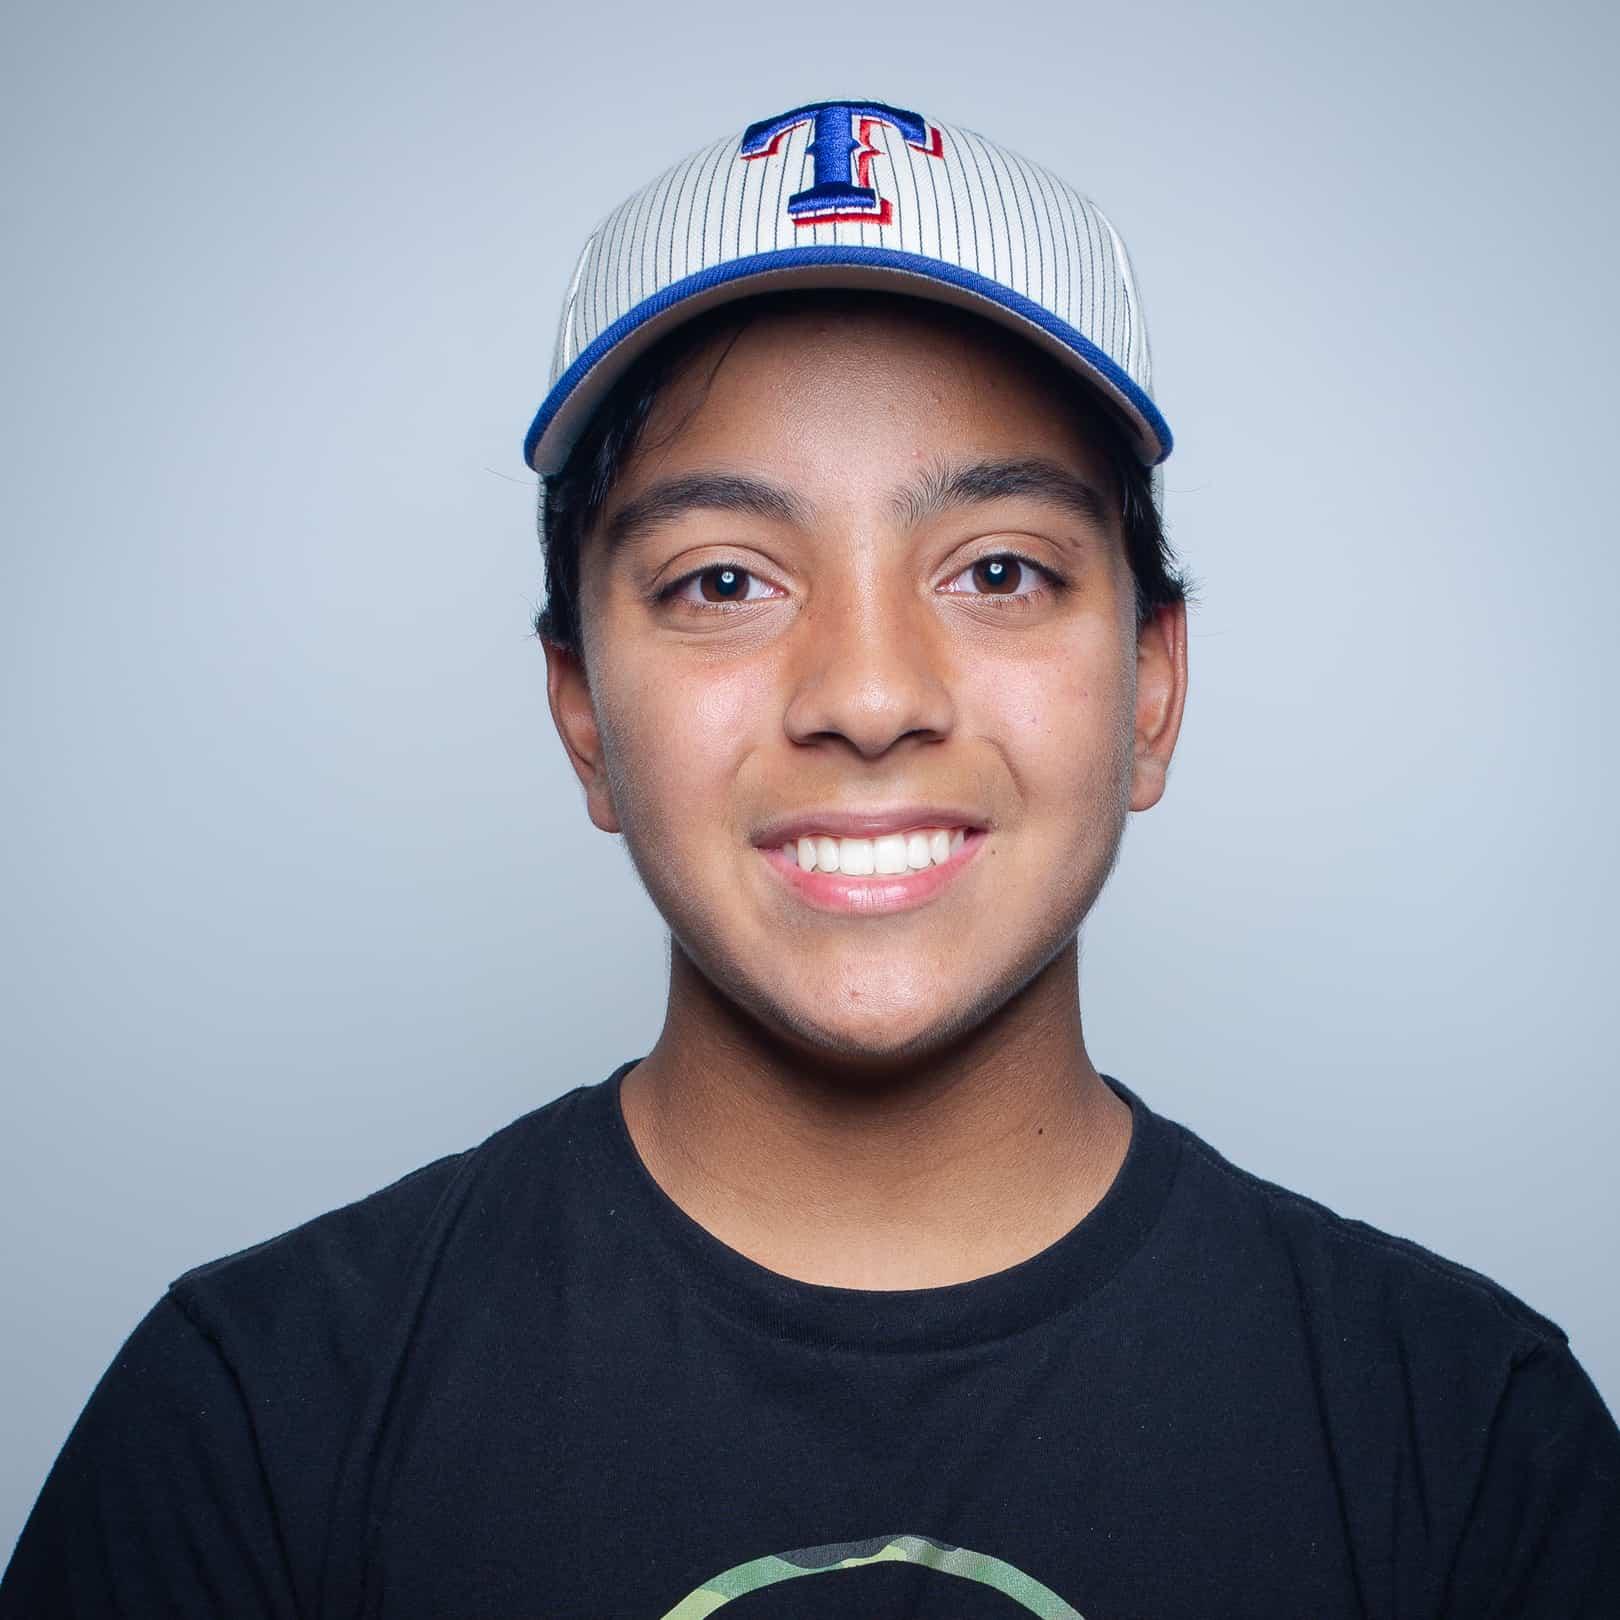 Reuland Orthodontics Patient Portraits 12 - Our Beautiful Smiles